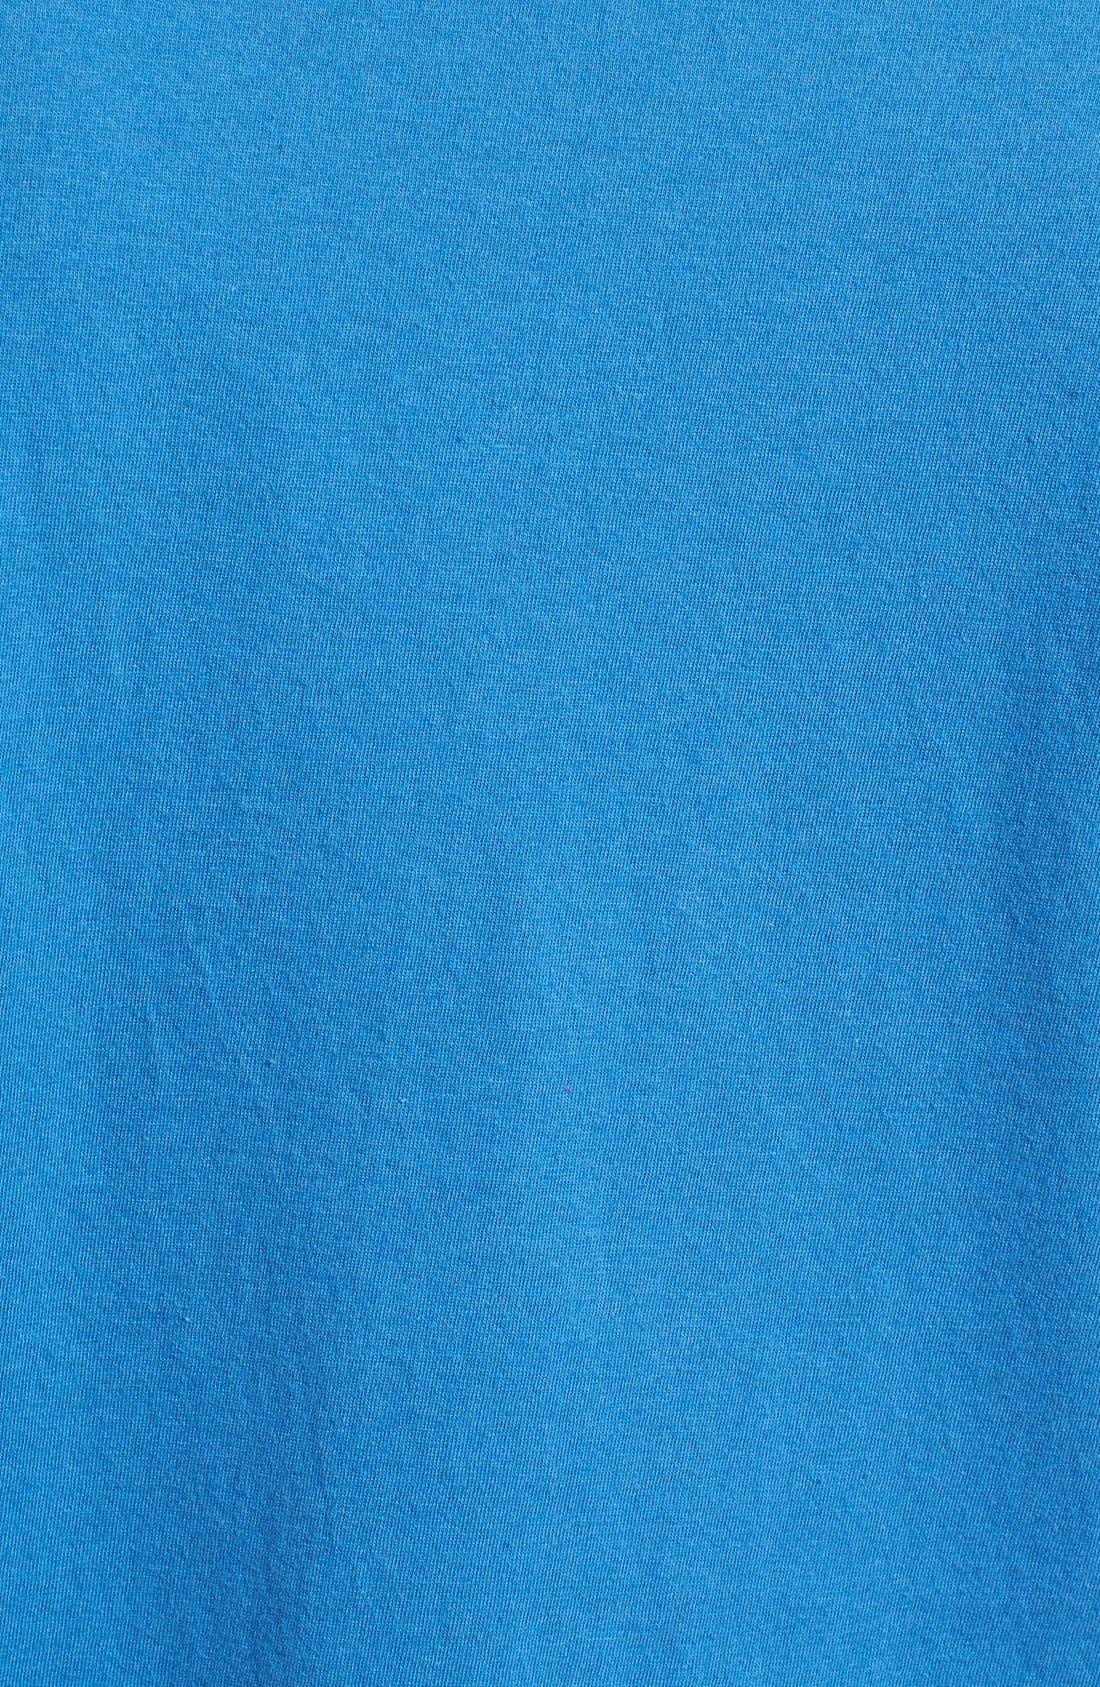 Alternate Image 5  - Red Jacket 'Chicago Cubs - Brass Tacks' Trim Fit T-Shirt